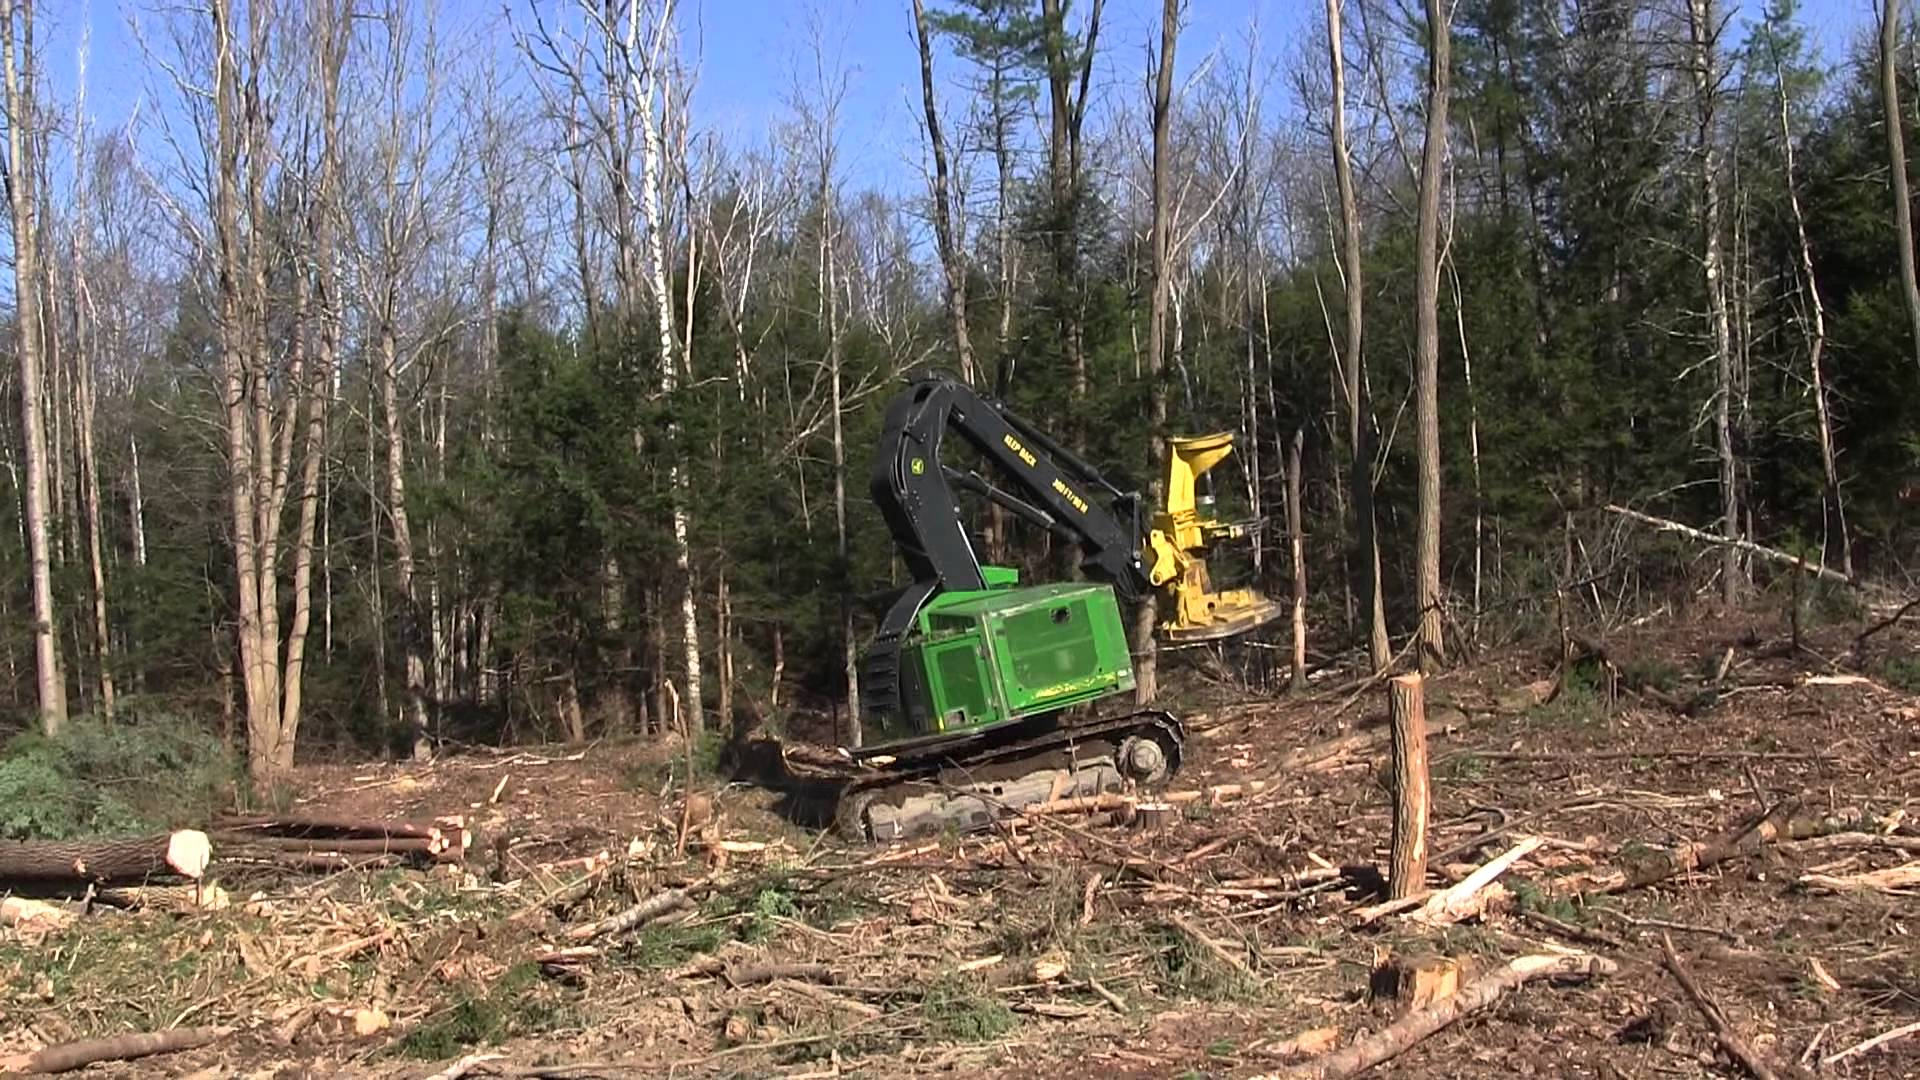 Deere 753J Feller Buncher Cutting Trees - YouTube